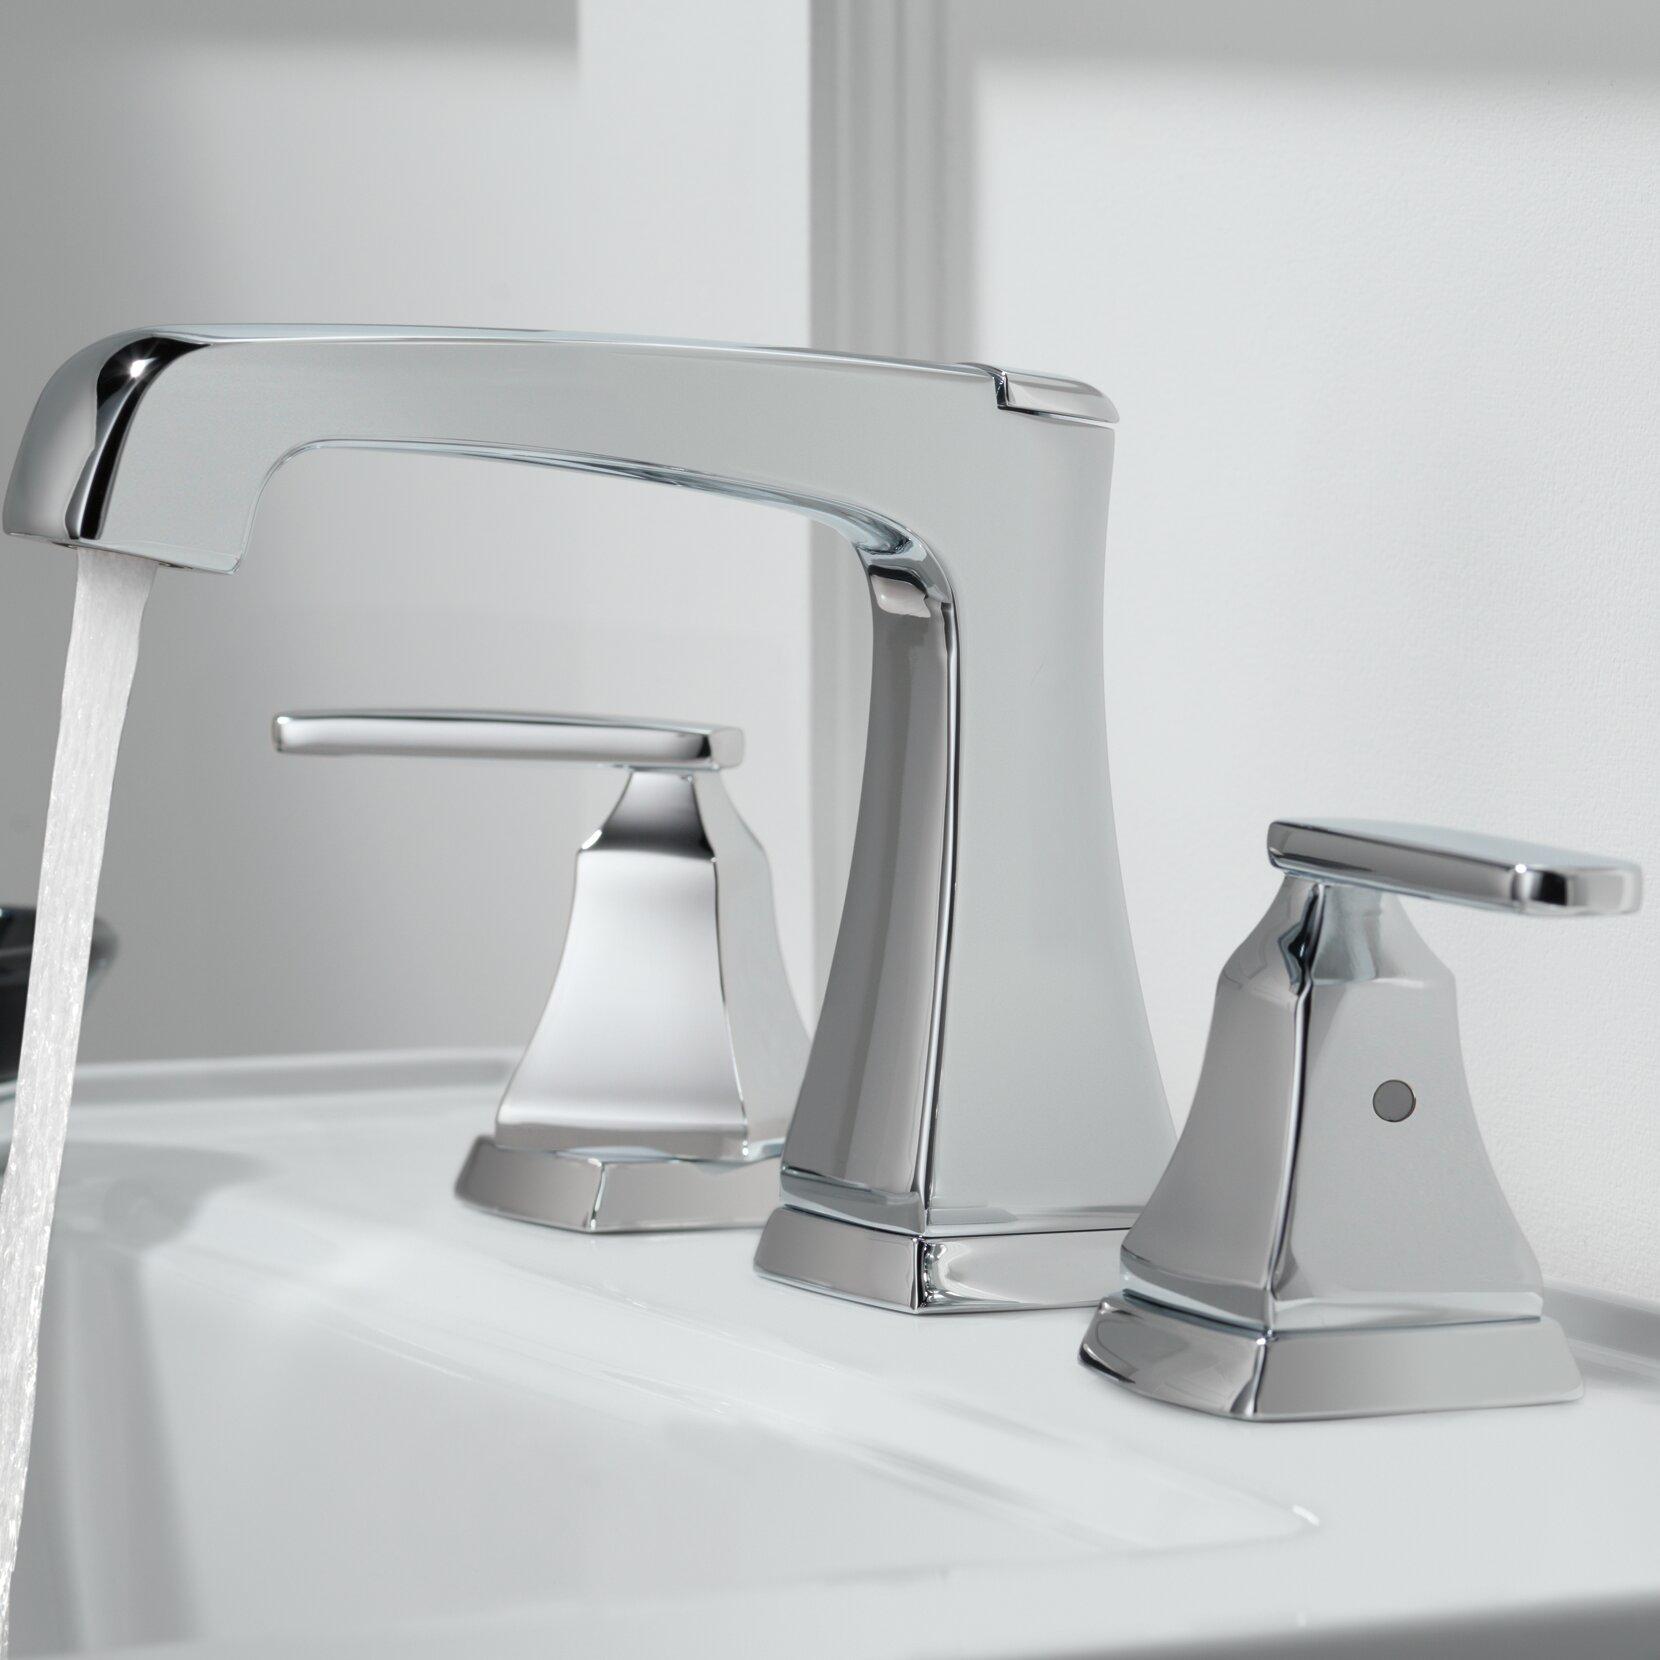 3564 Ssmpu Dst Rbmpu Mpu Delta Ashlyn Widespread Bathroom Faucet Drain Embly And Diamond Seal Technology Reviews Wayfair